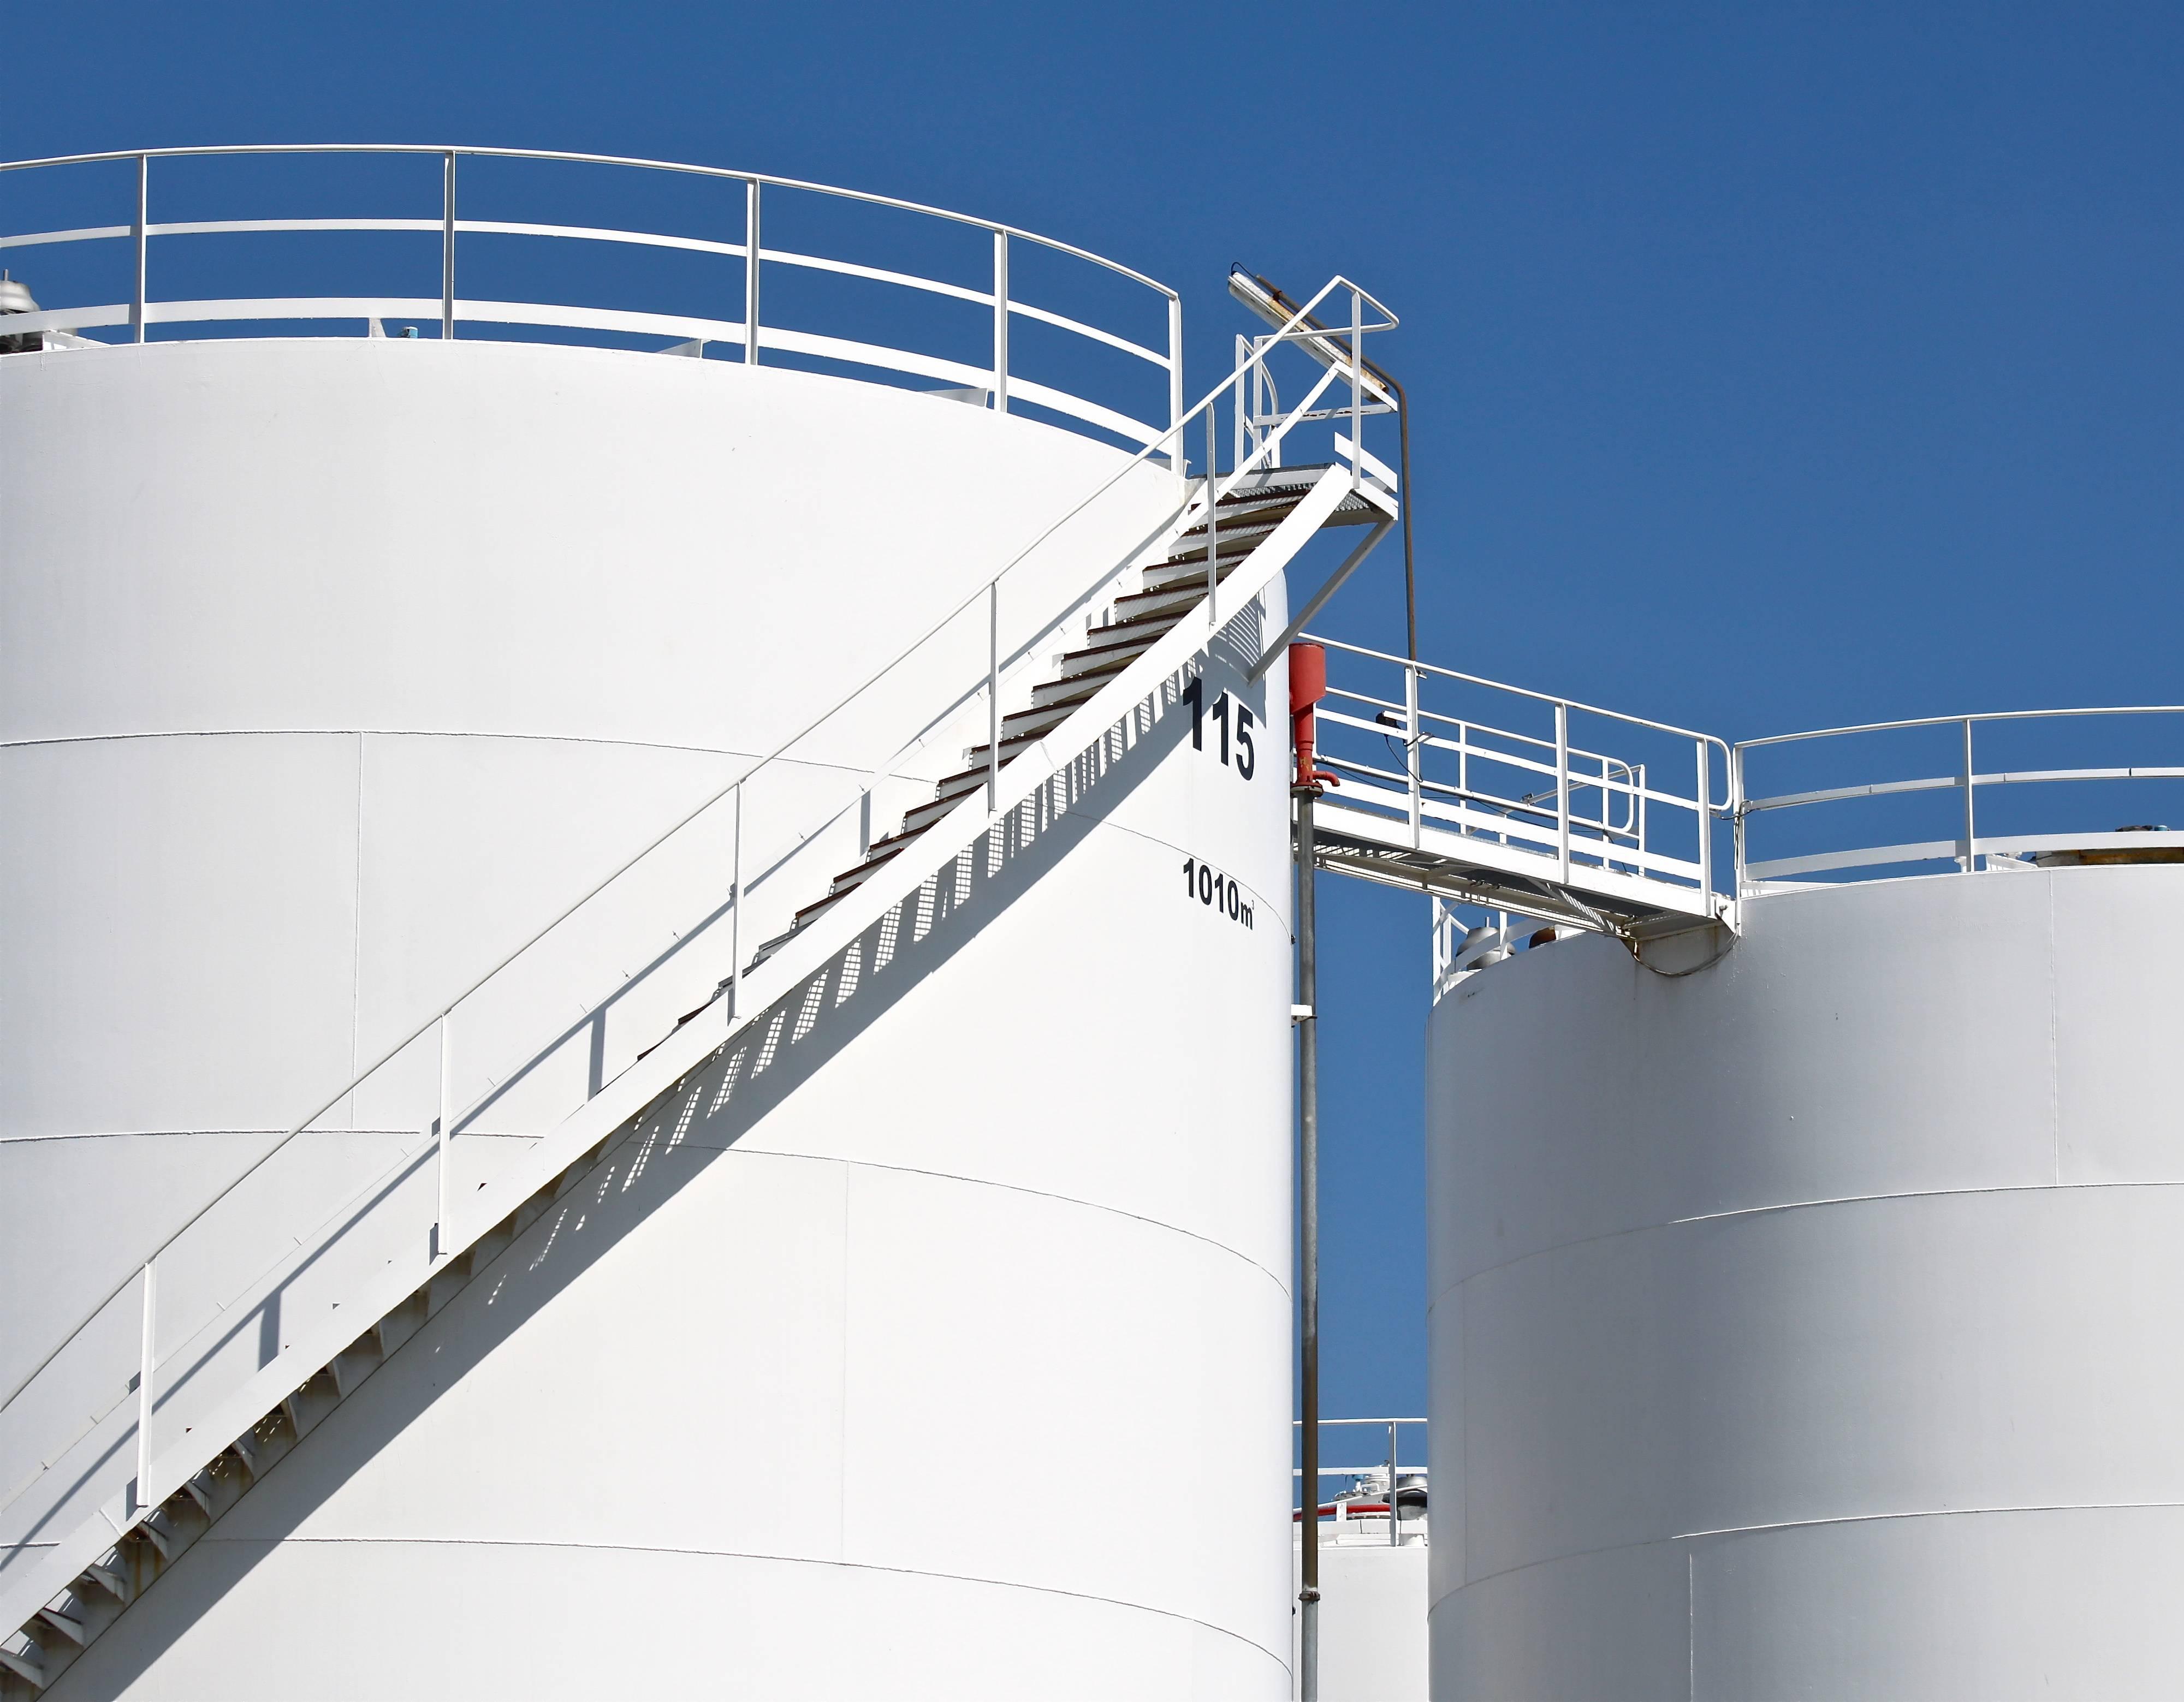 US crude stockpiles